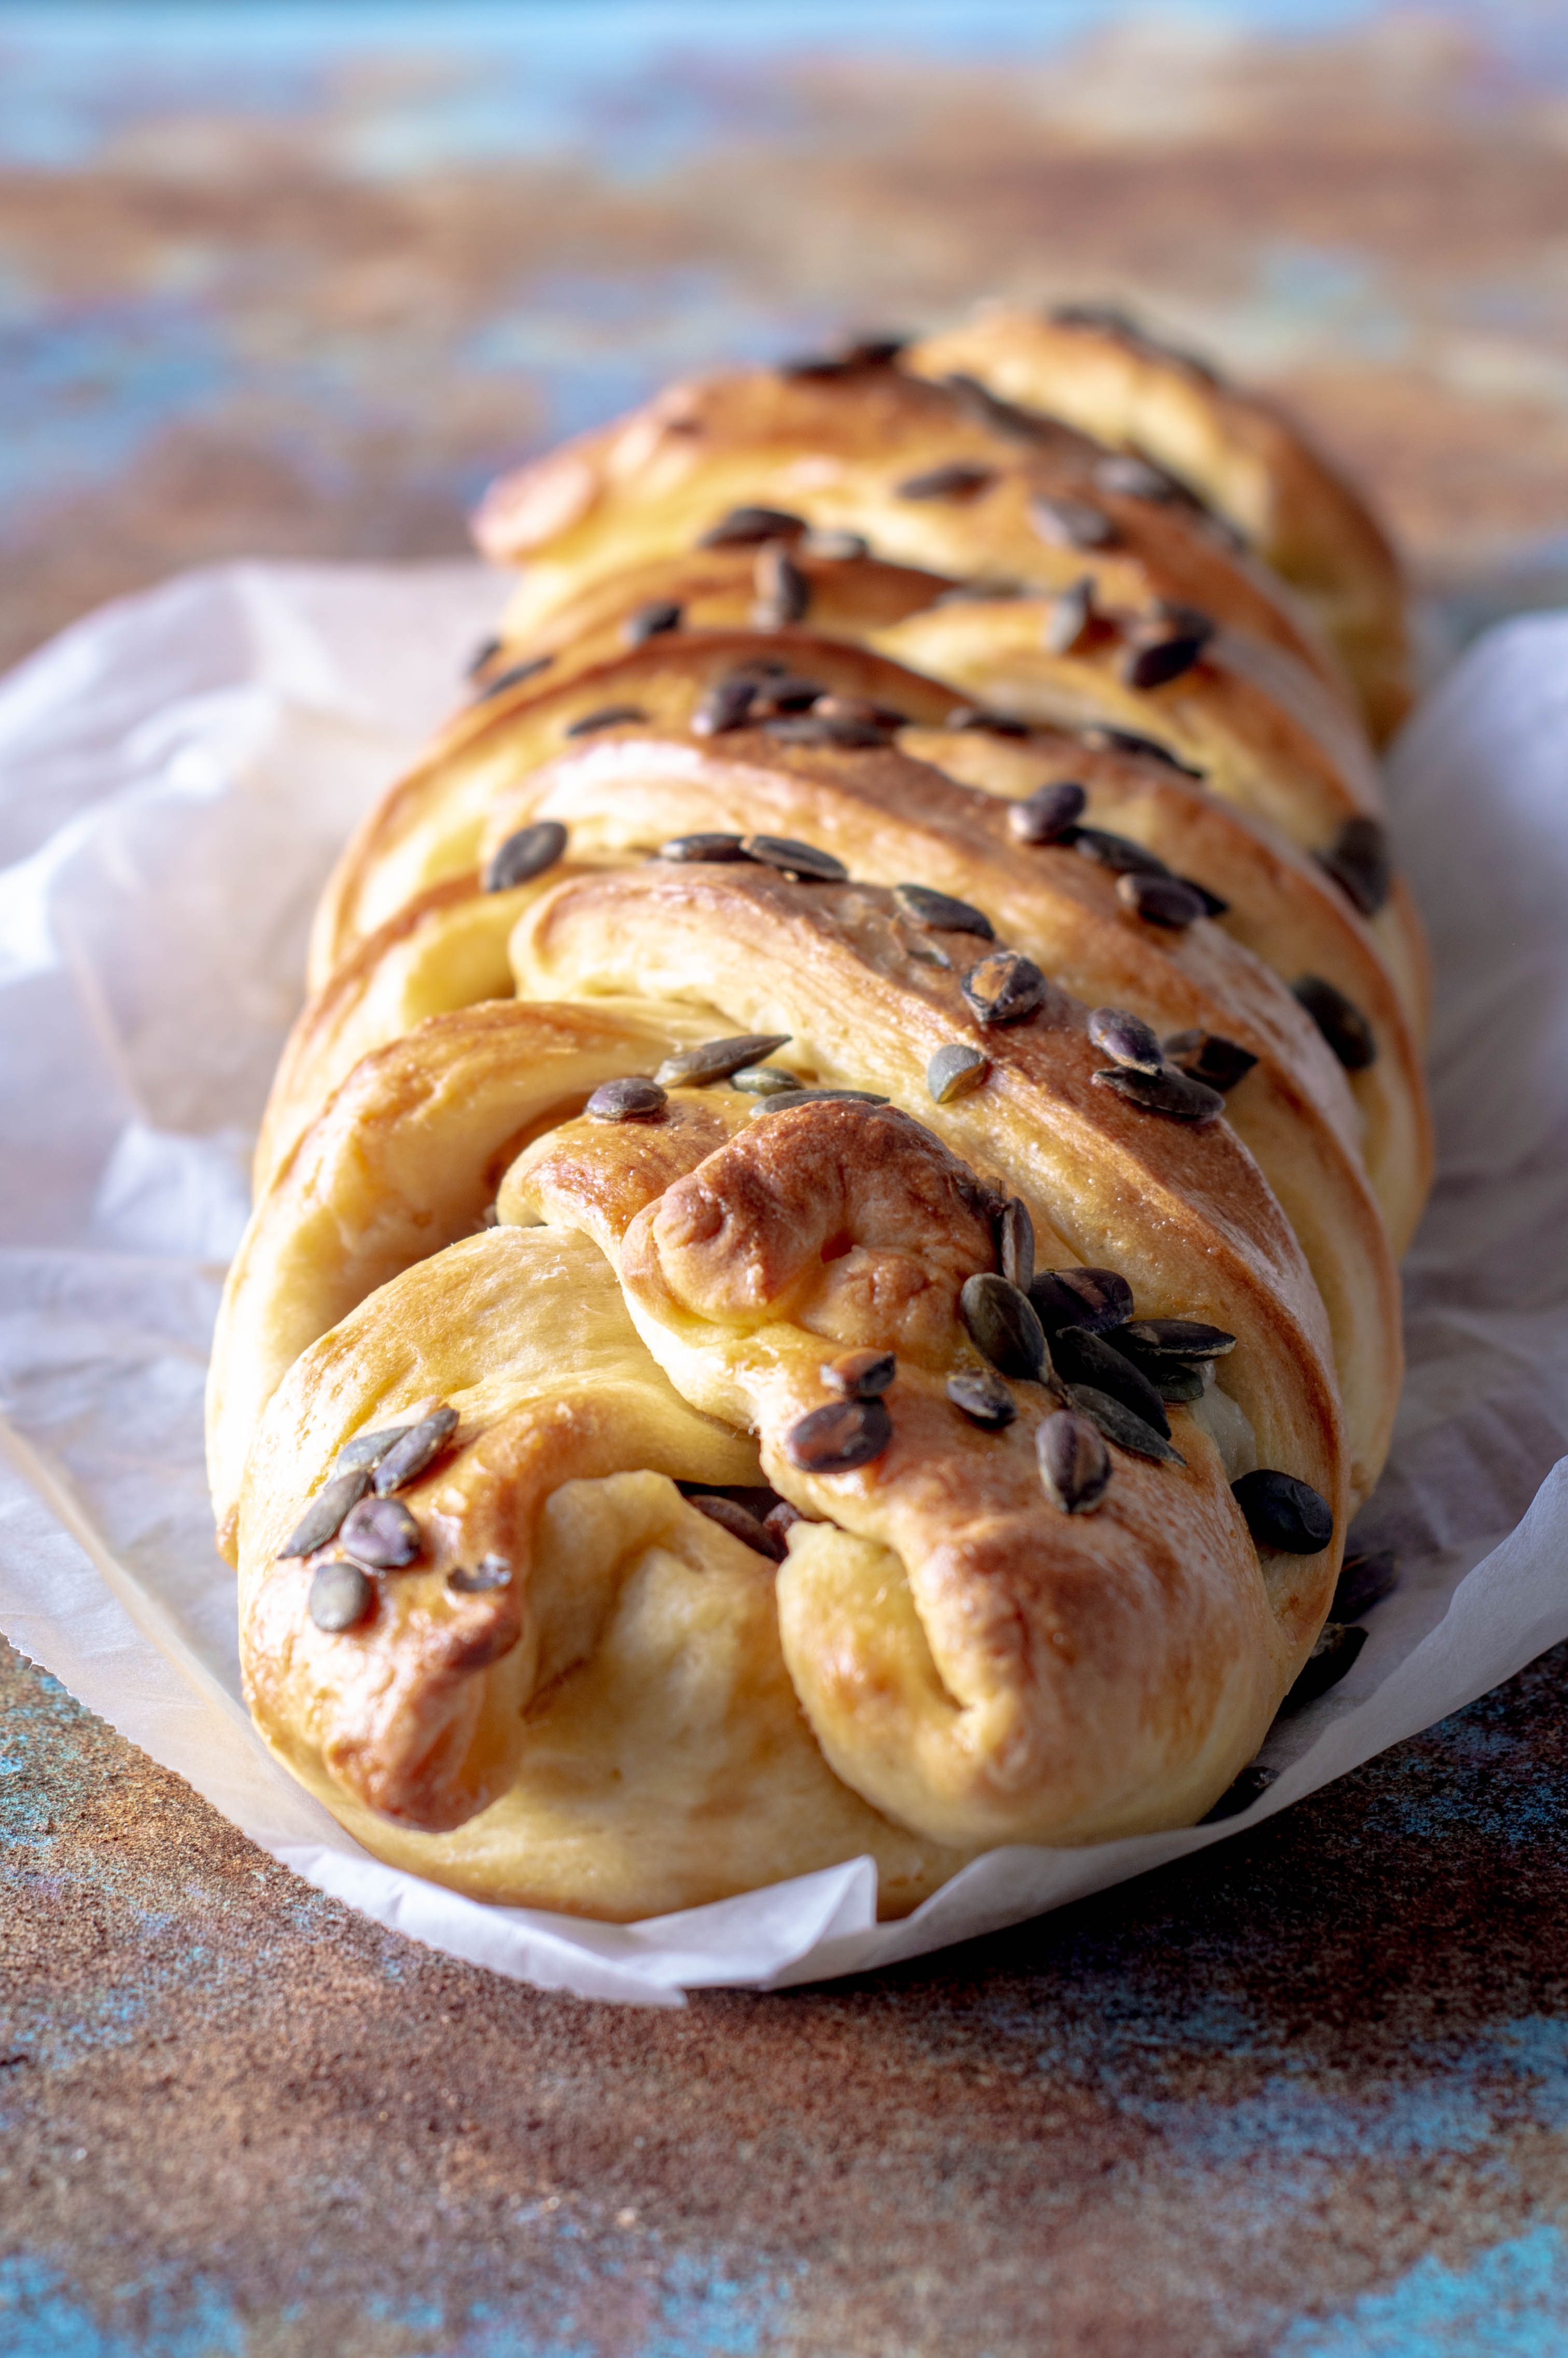 treccia-pane-mozzarella-melanzane